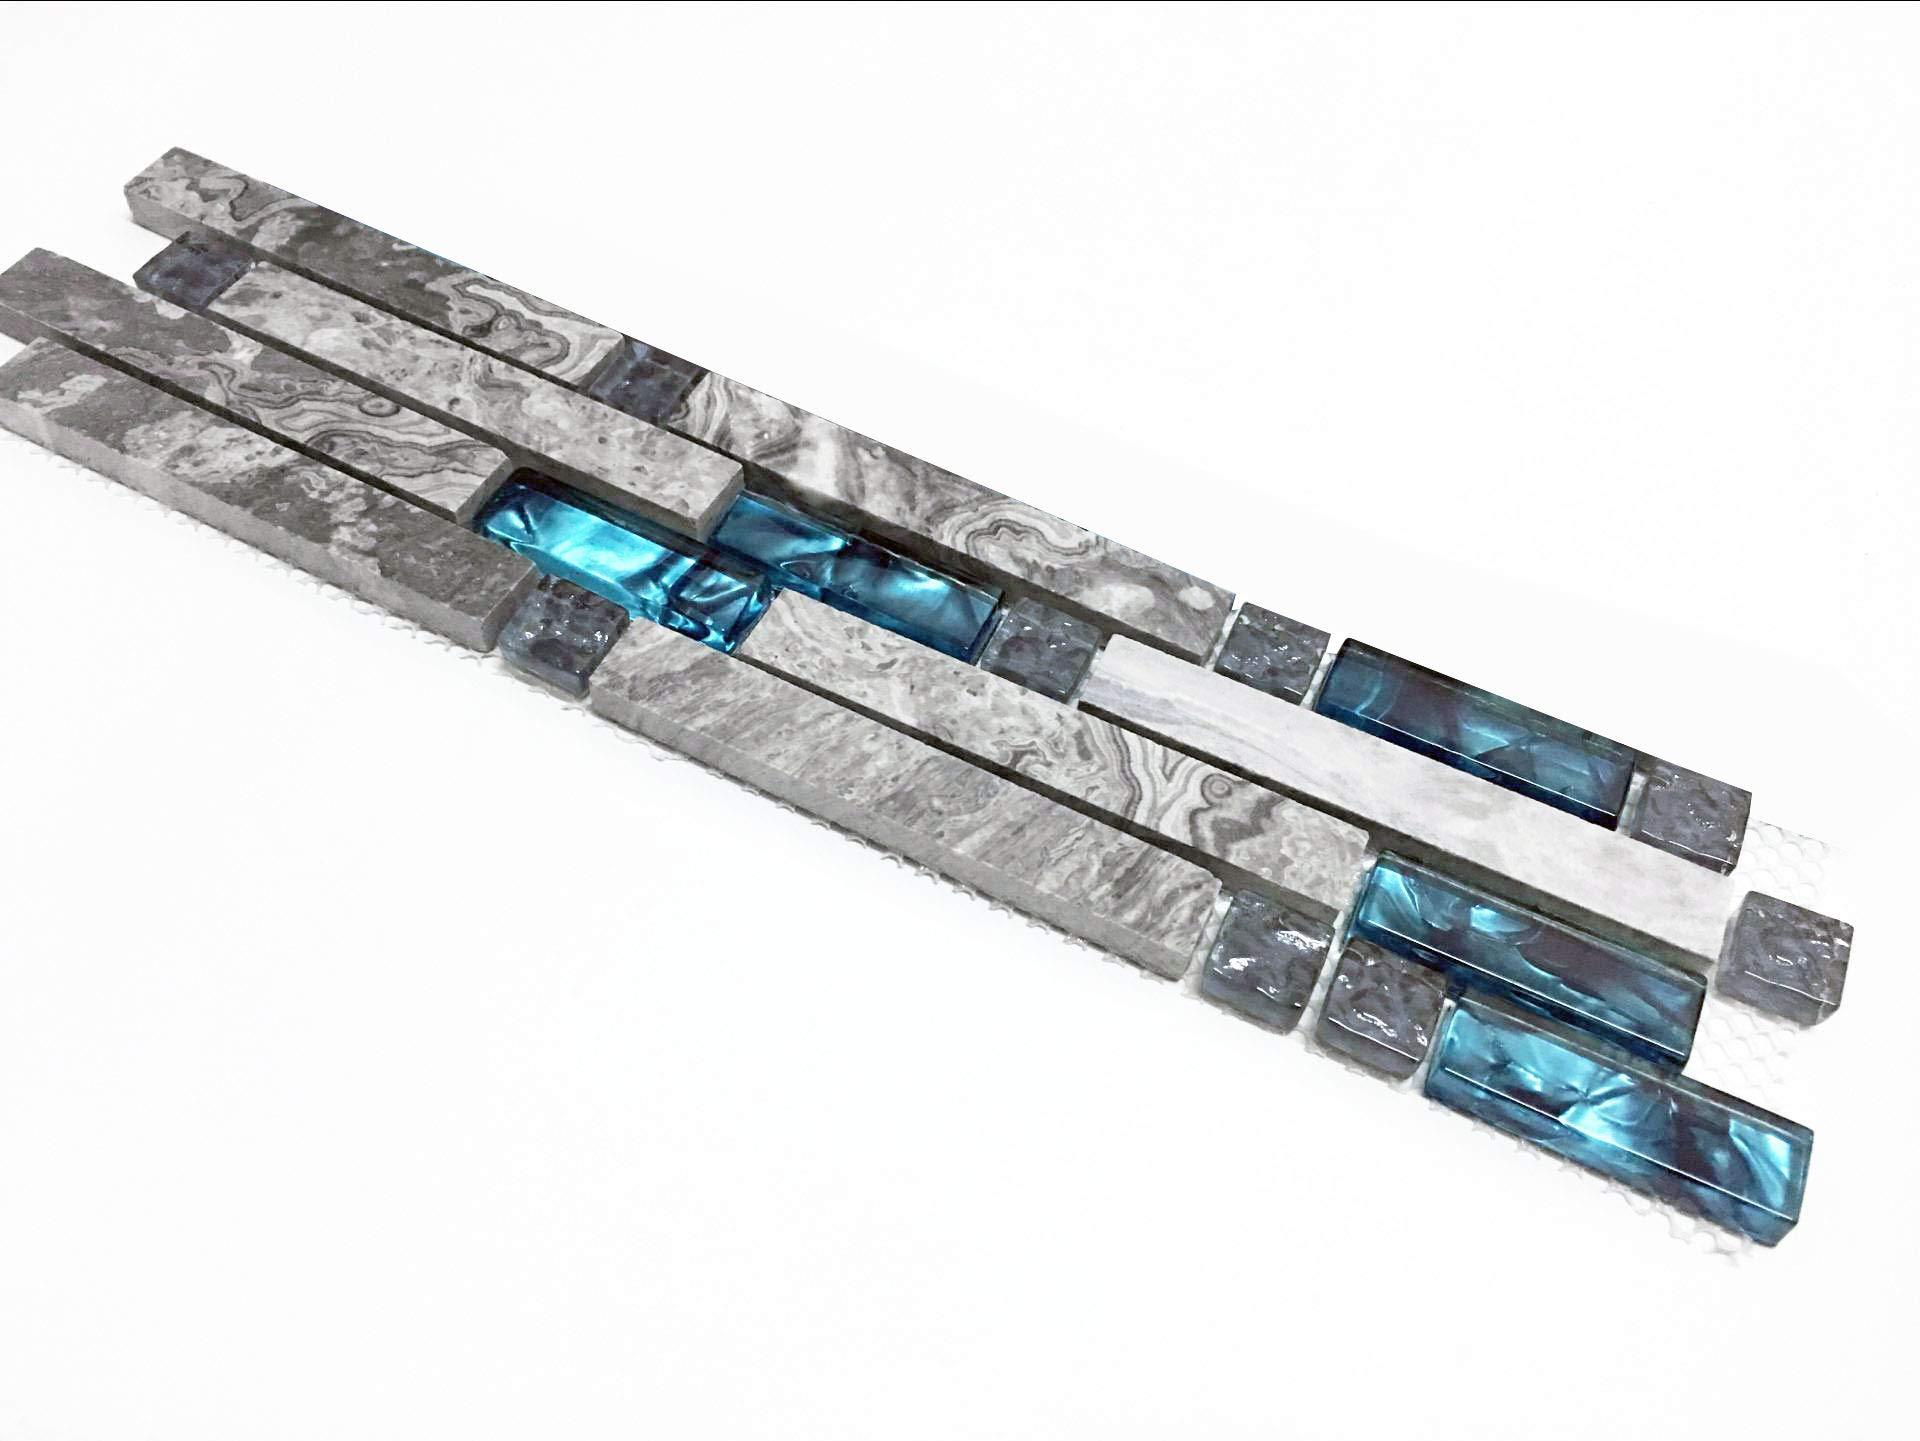 Hominter Tile Sample 3 x 12 Inches: Gray Marble Backsplash Tile, Teal Blue Glass Strip Interlocking Patterns - Bathroom, Kitchen, Shower, Accent Wall 9805 by Hominter (Image #1)